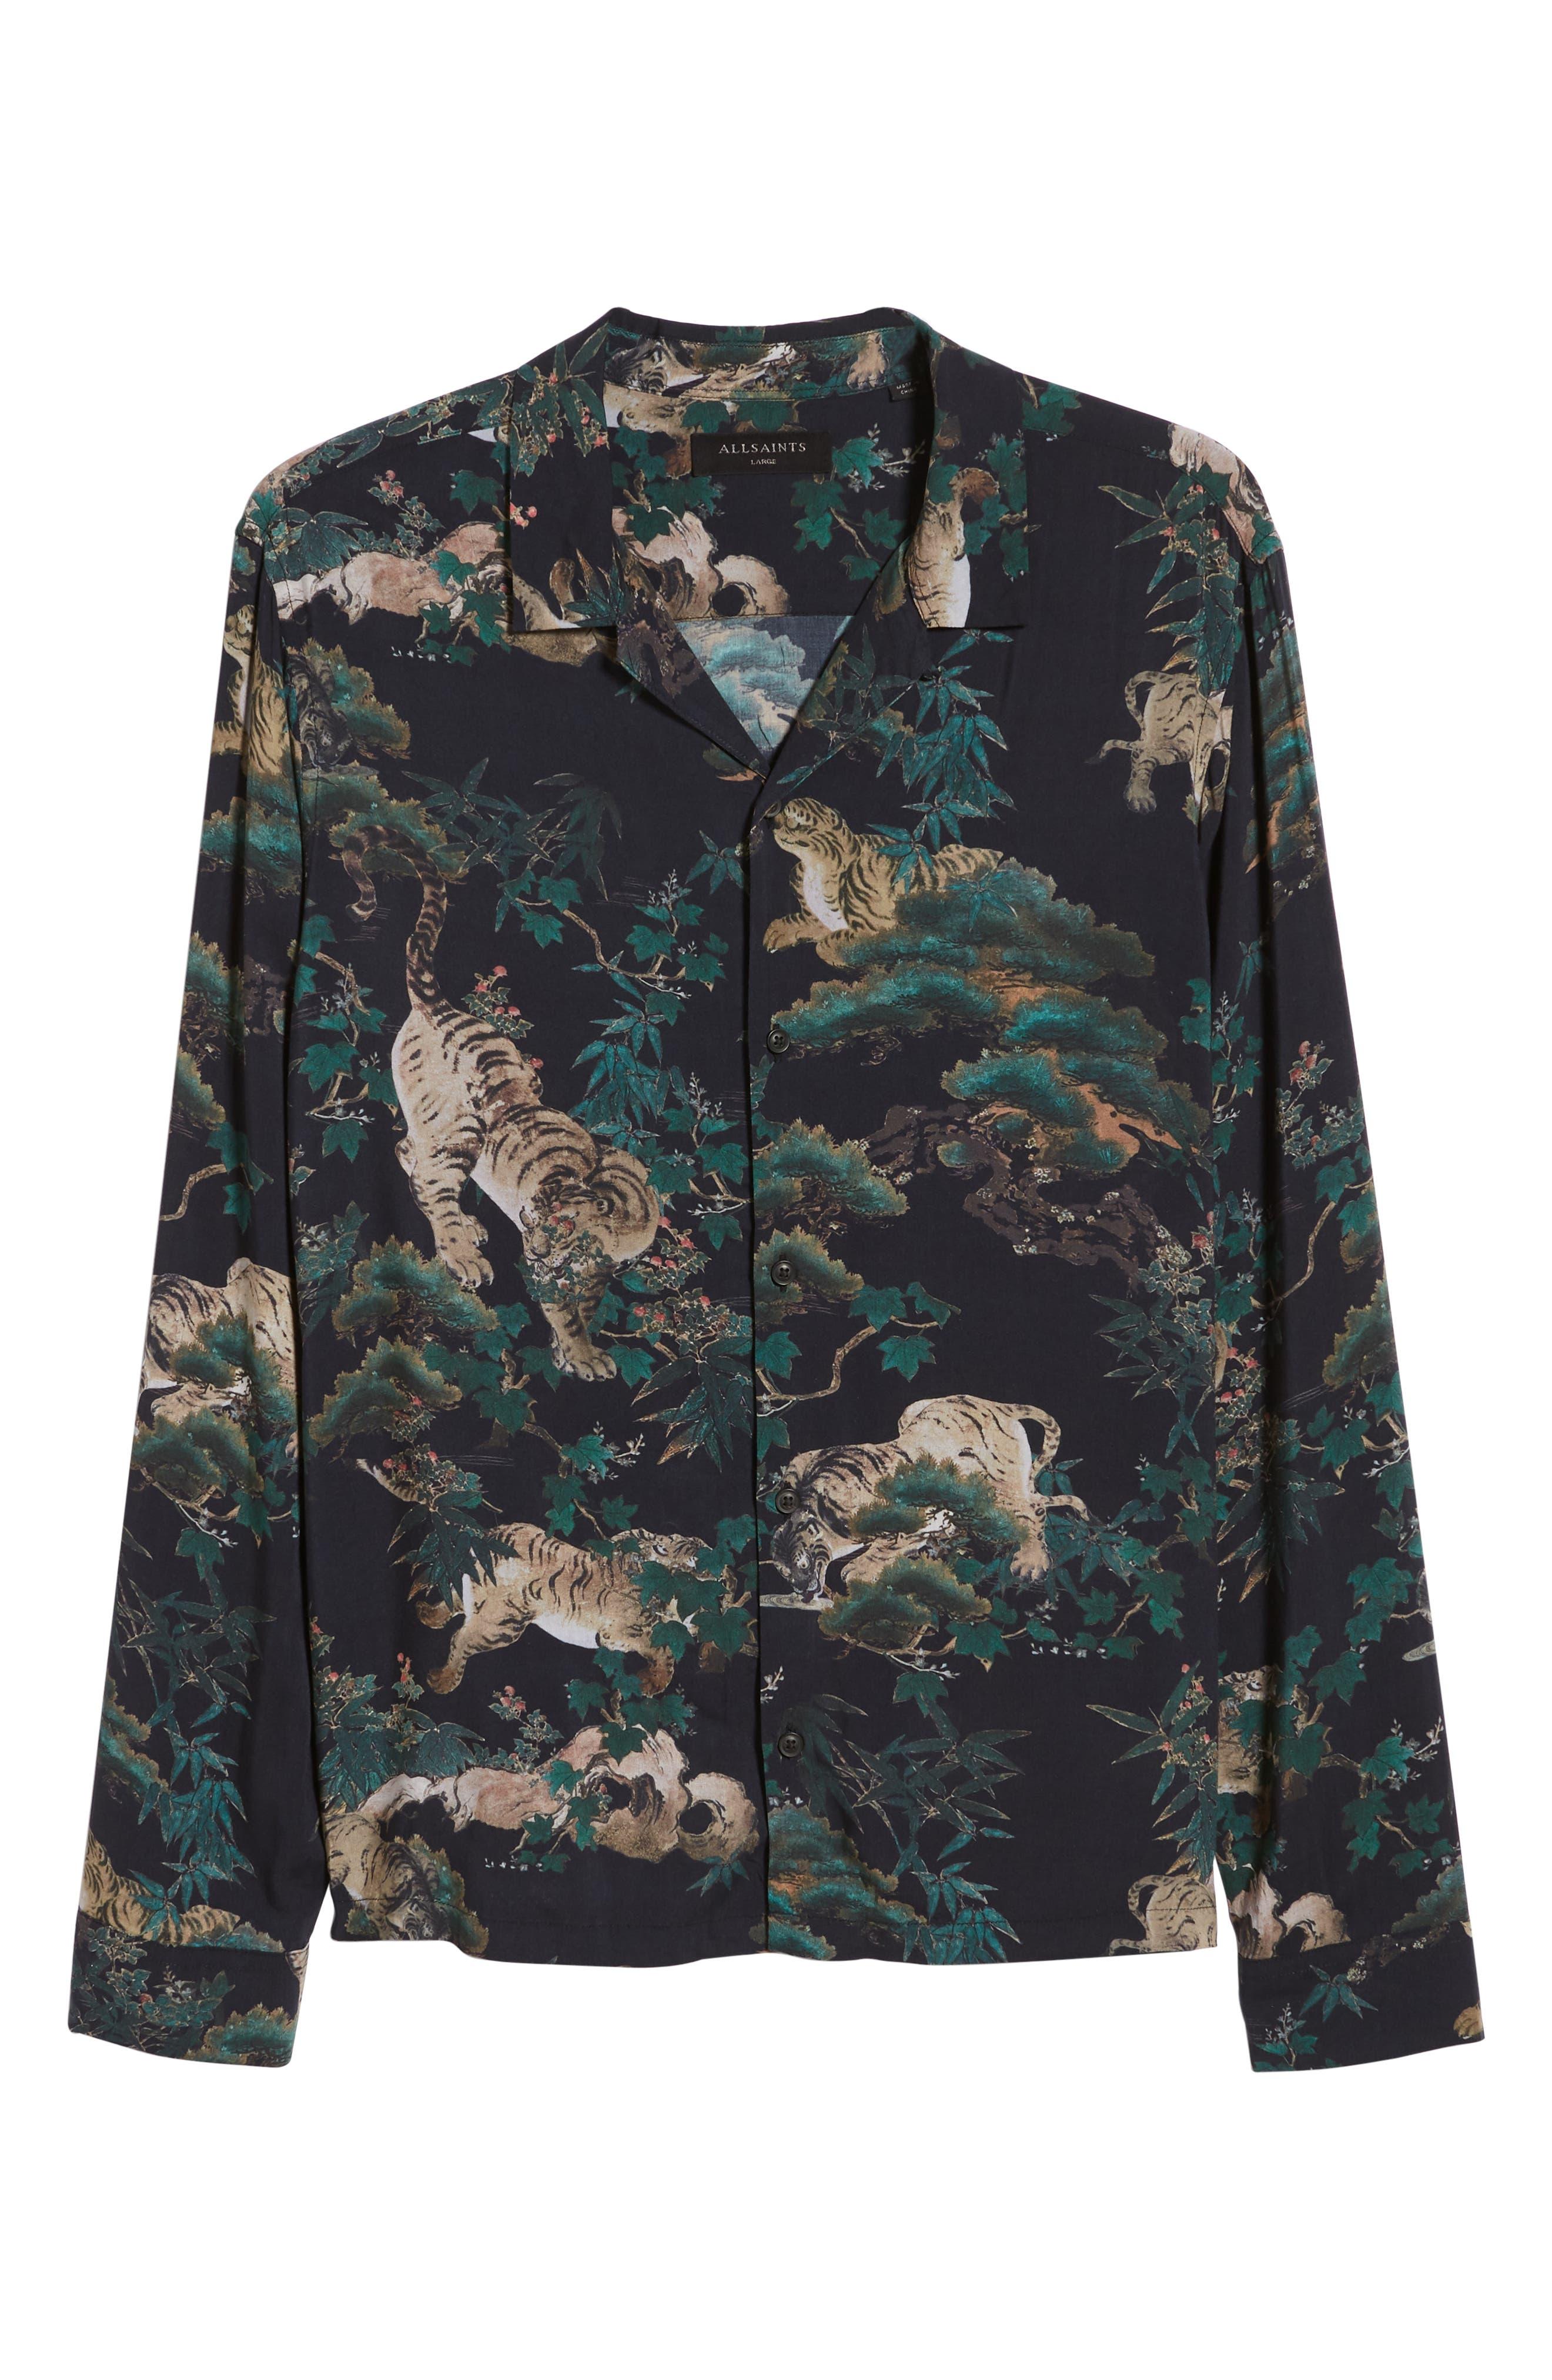 ALLSAINTS, Thicket Tiger Print Sport Shirt, Alternate thumbnail 4, color, 003